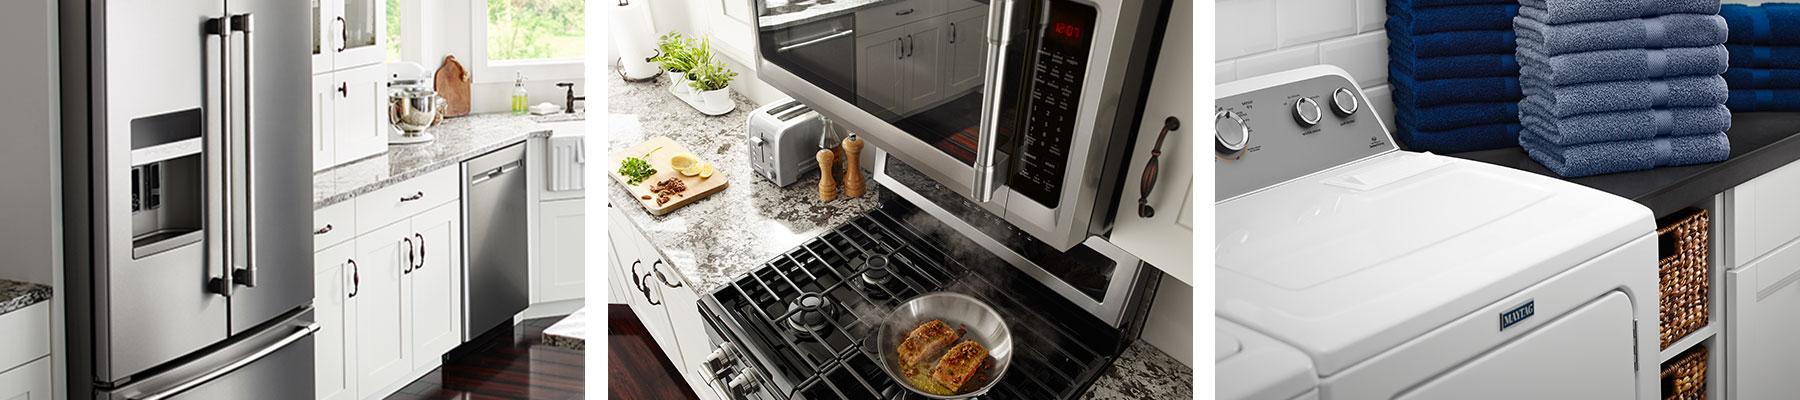 Contacts - appliances